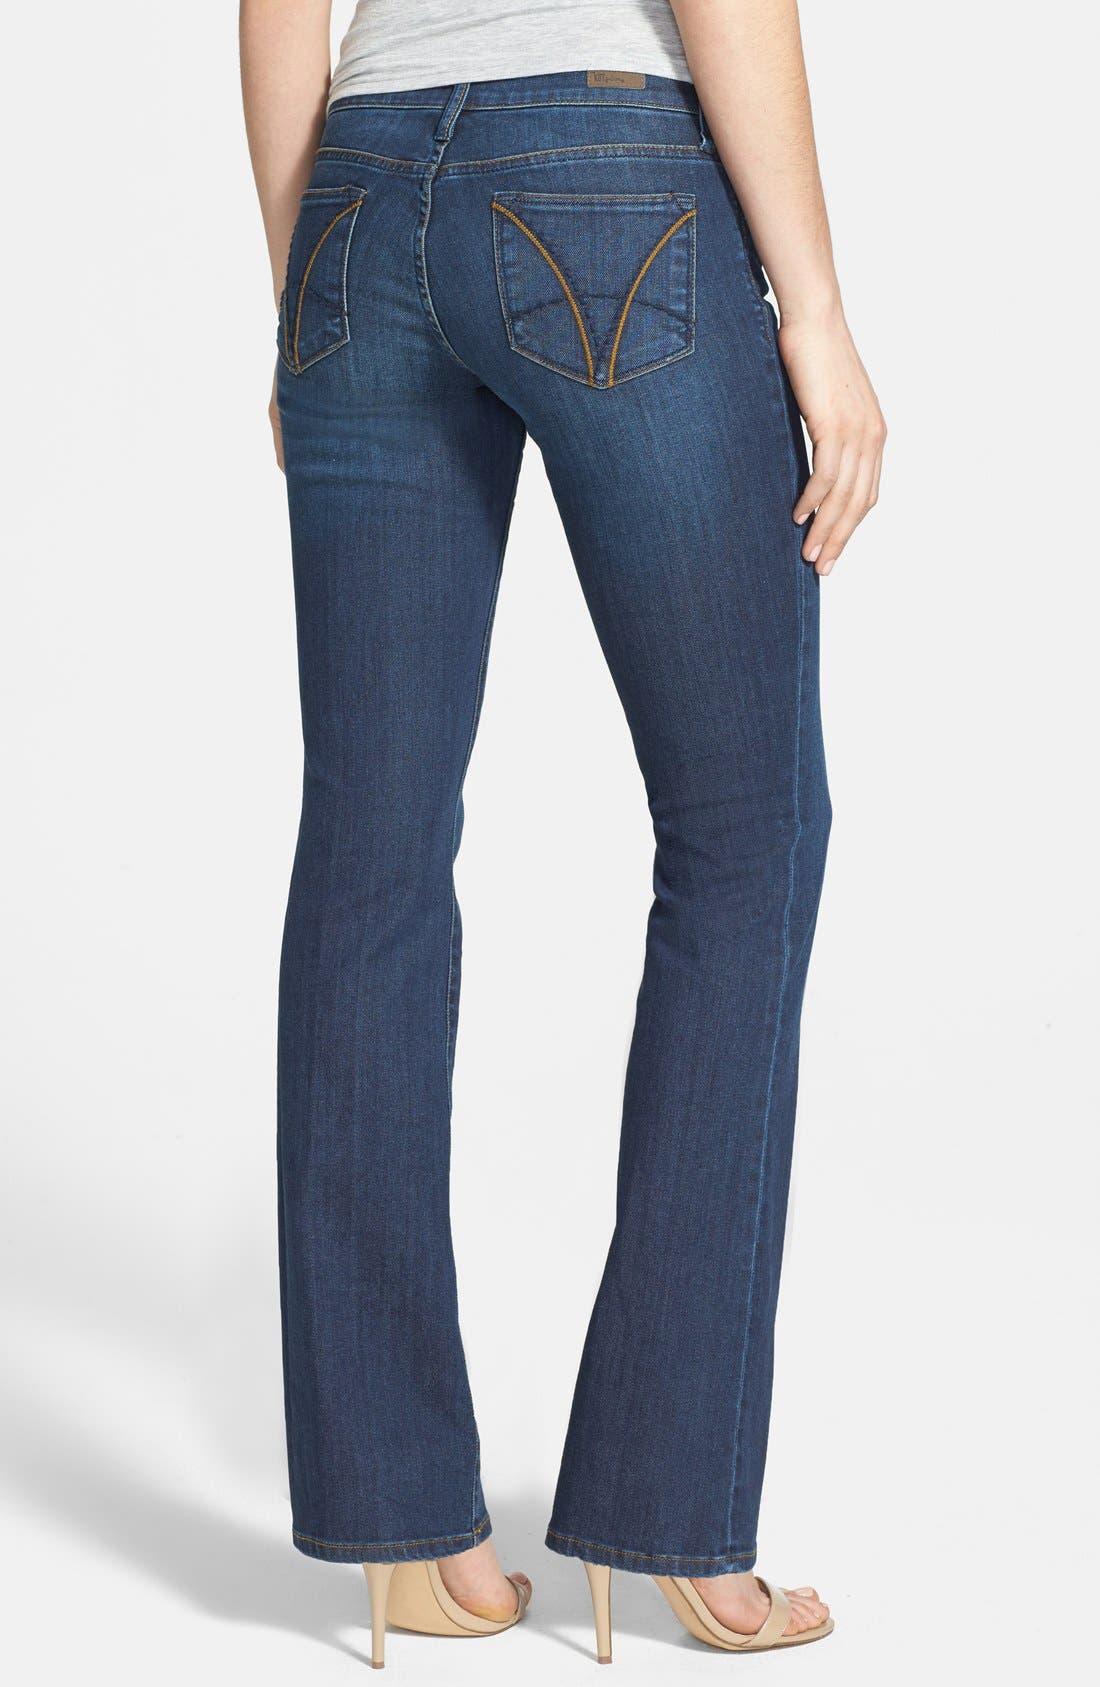 'Farrah' Baby Bootcut Jeans,                             Alternate thumbnail 2, color,                             400